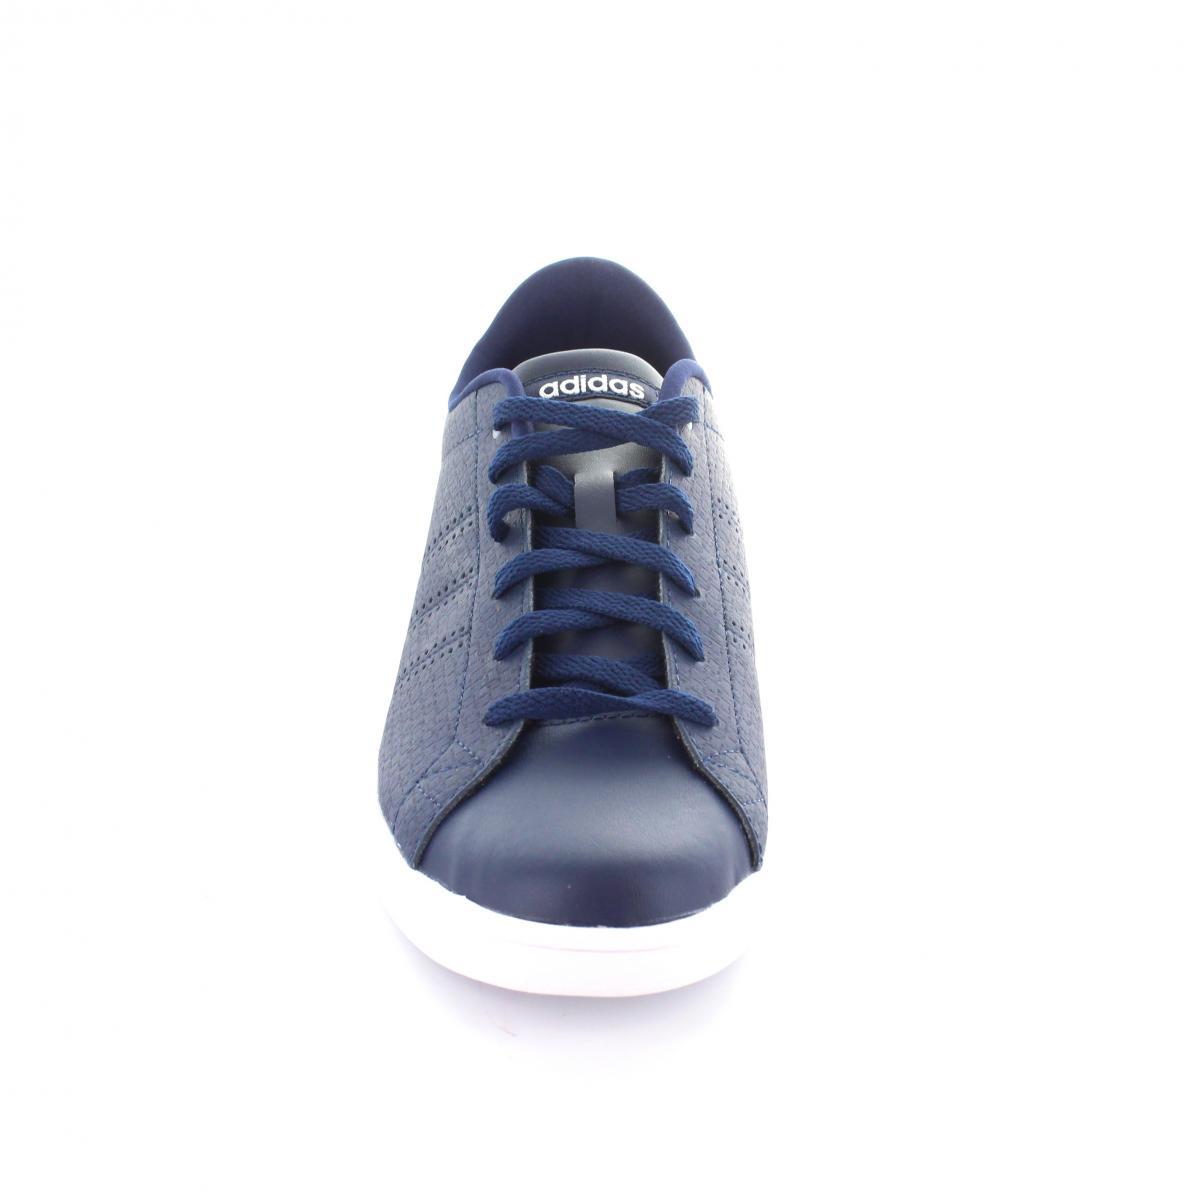 128e2b67c63 Tenis marca Adidas modelo BB9612 Color Azul Marino